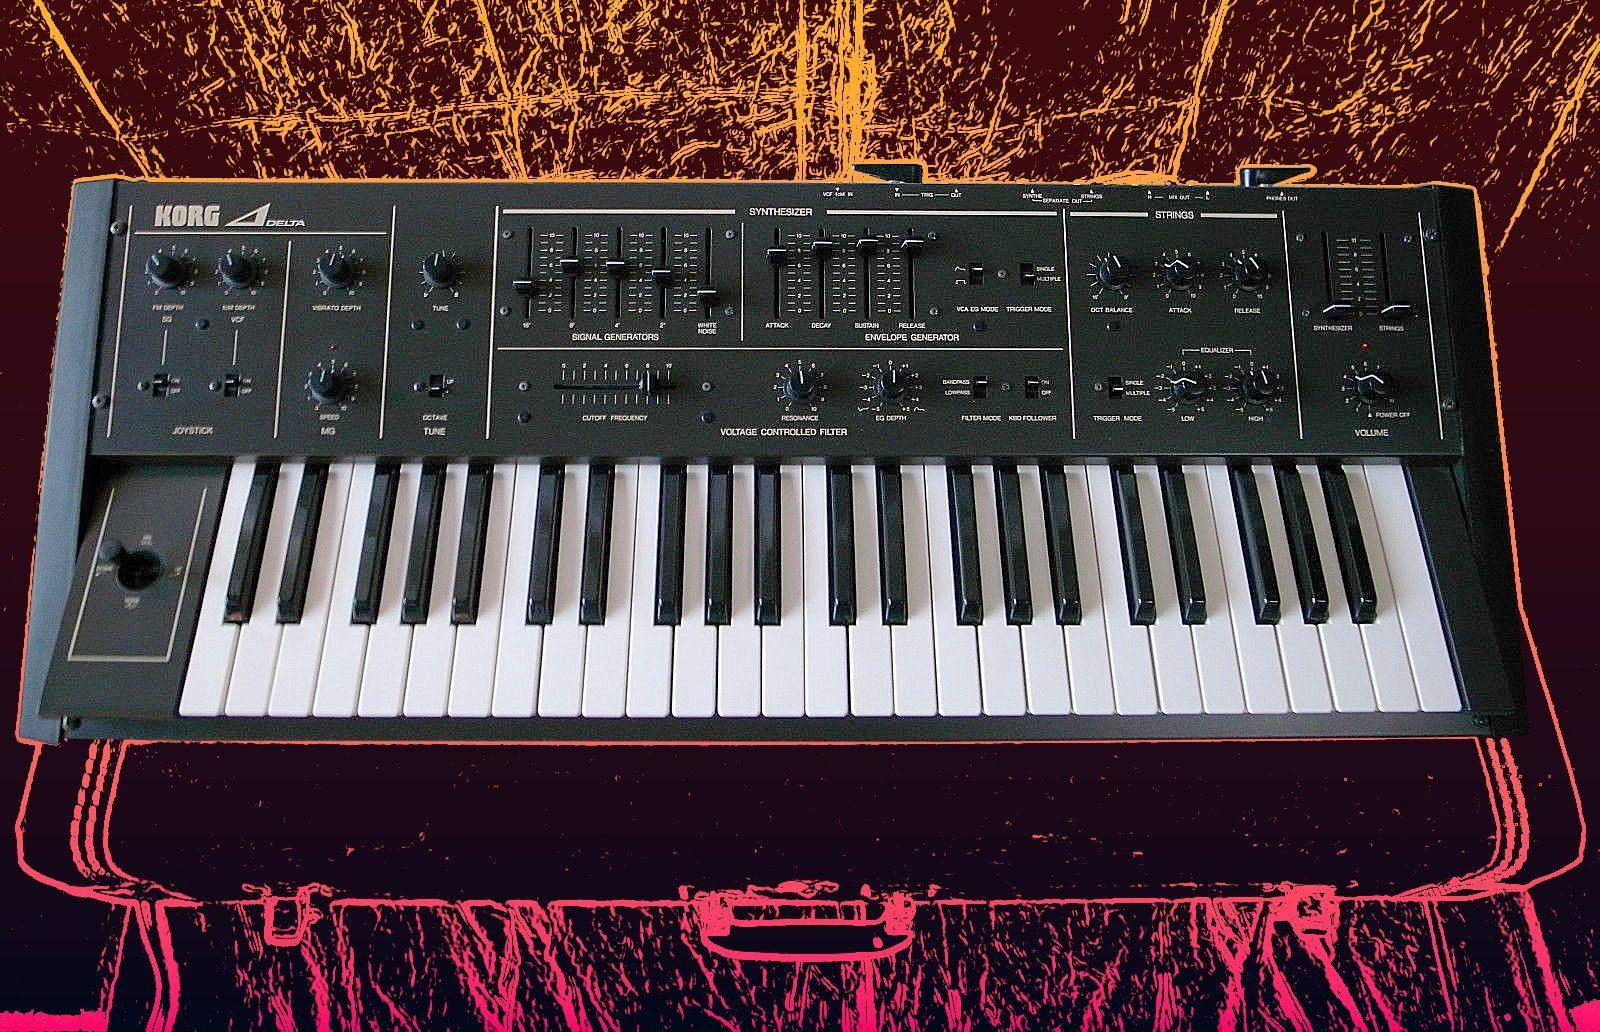 Retro-Erlebnis Synthesizer selber bauen Franzis Synthesizer Bausatz